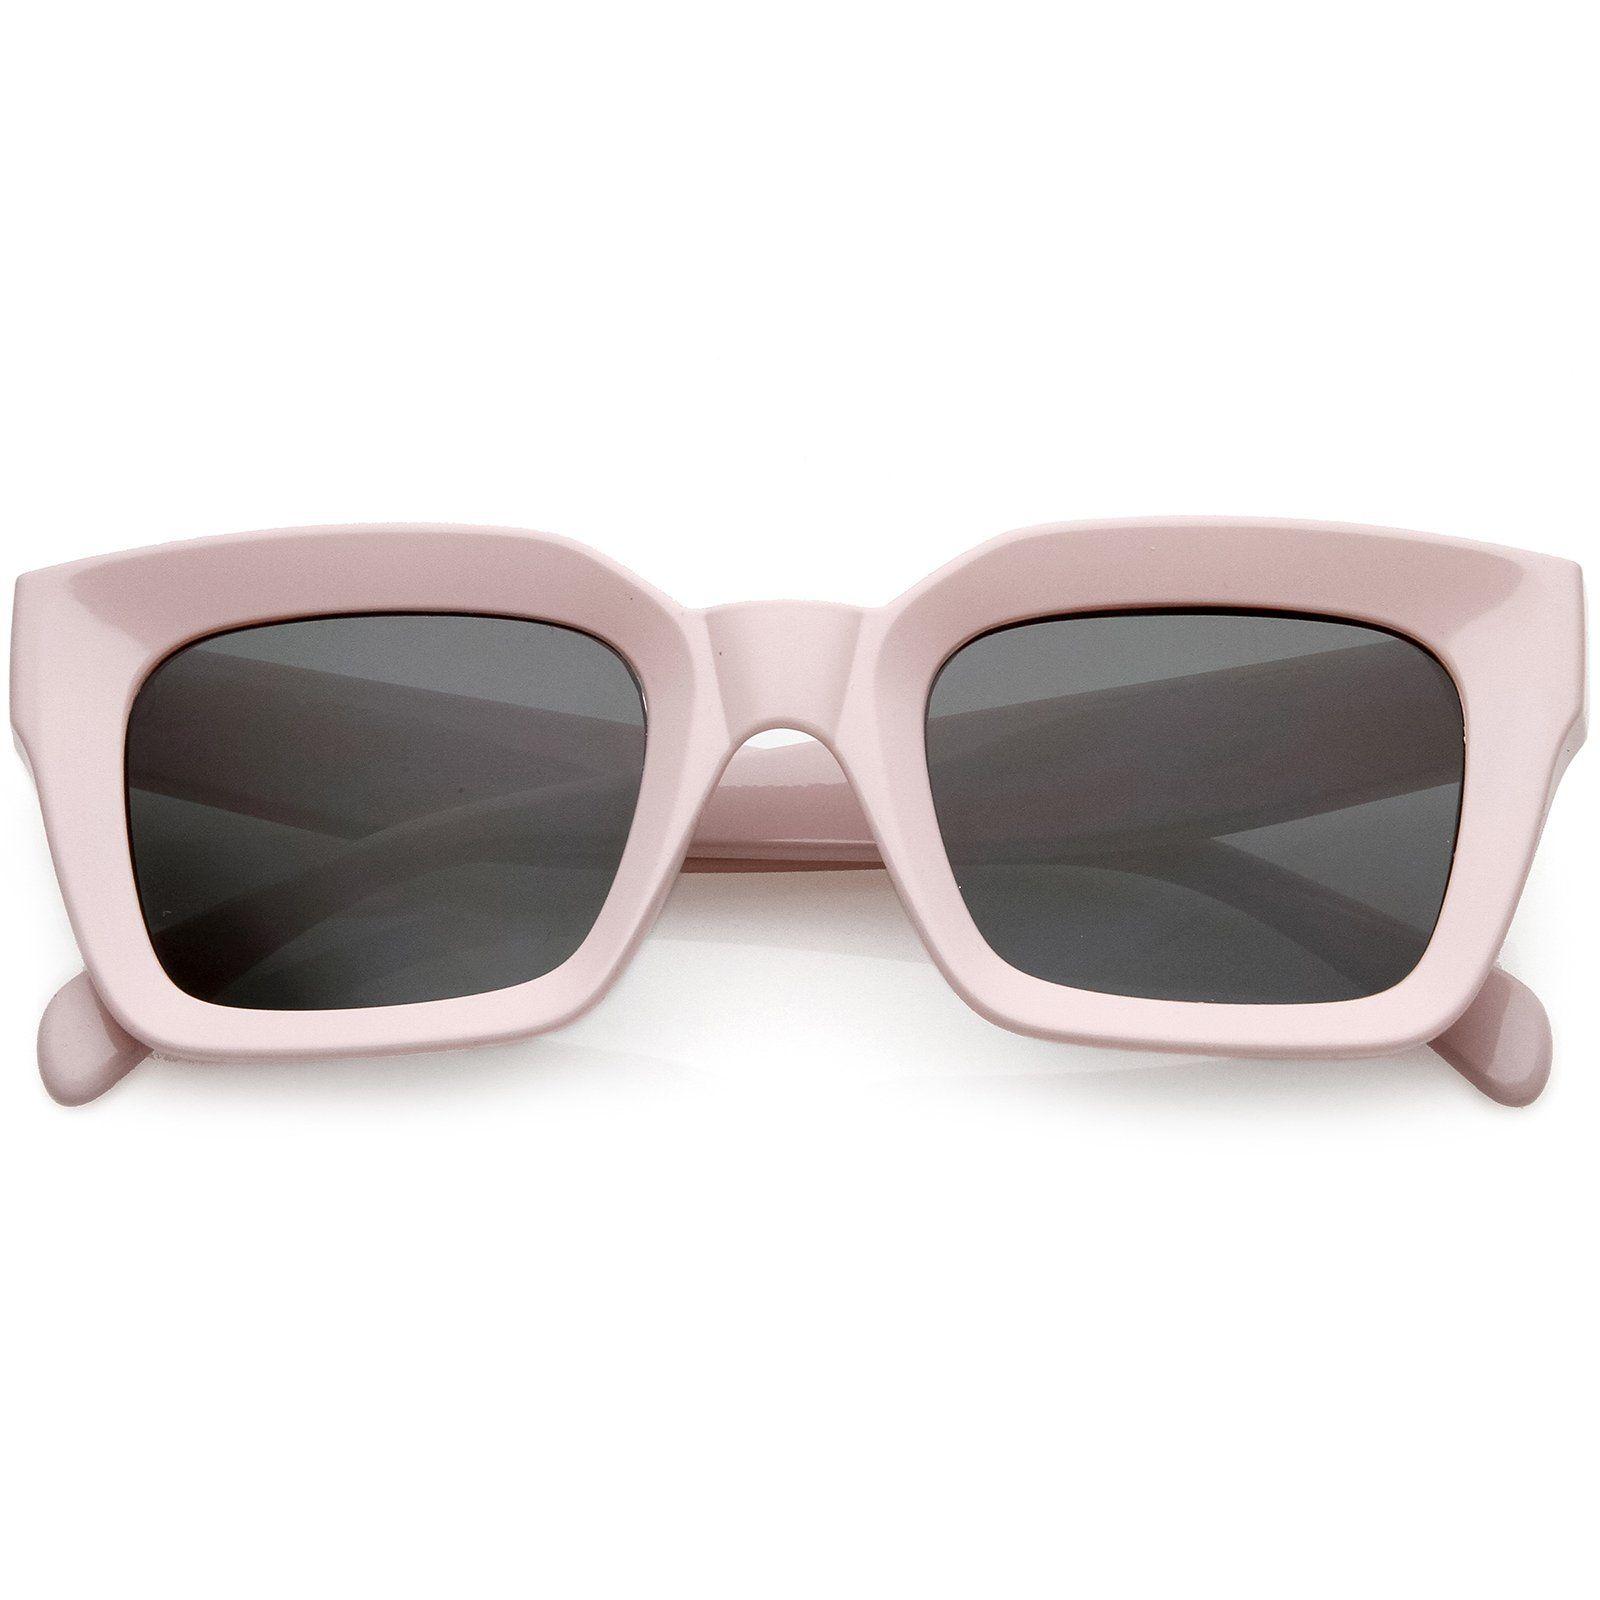 1669b1e97 Chunky Retro Square Sunglasses Neutral Colored Flat Lens 48mm #bold # sunglasses #frame #sunglass #oversized #purple #summer #mirrored #cateye  #sunglassla